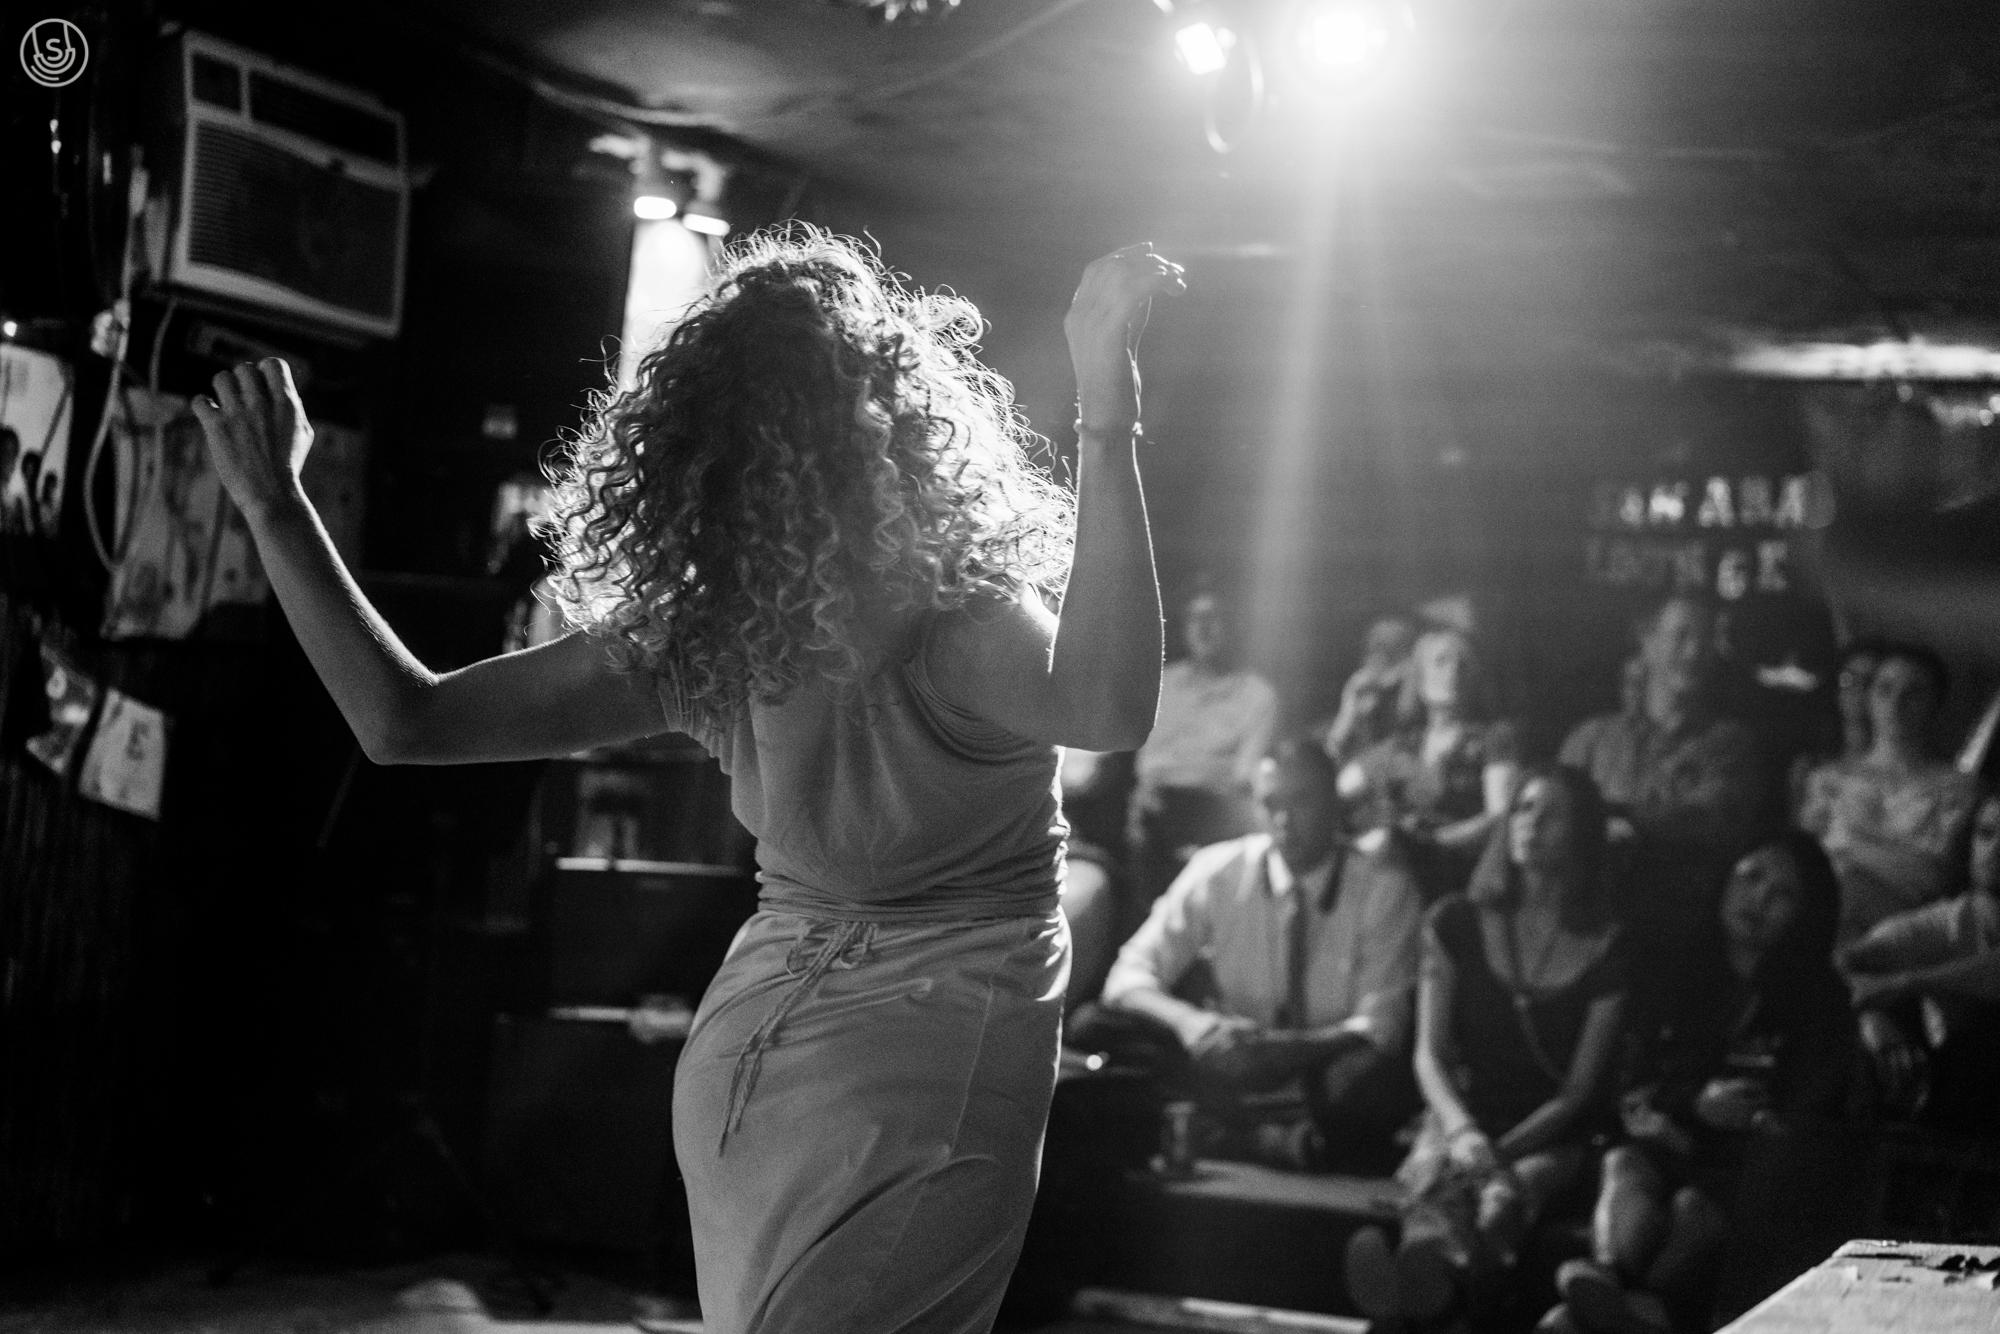 Collaboration: Lory Lyon + Hailley Laurèn, spoken word